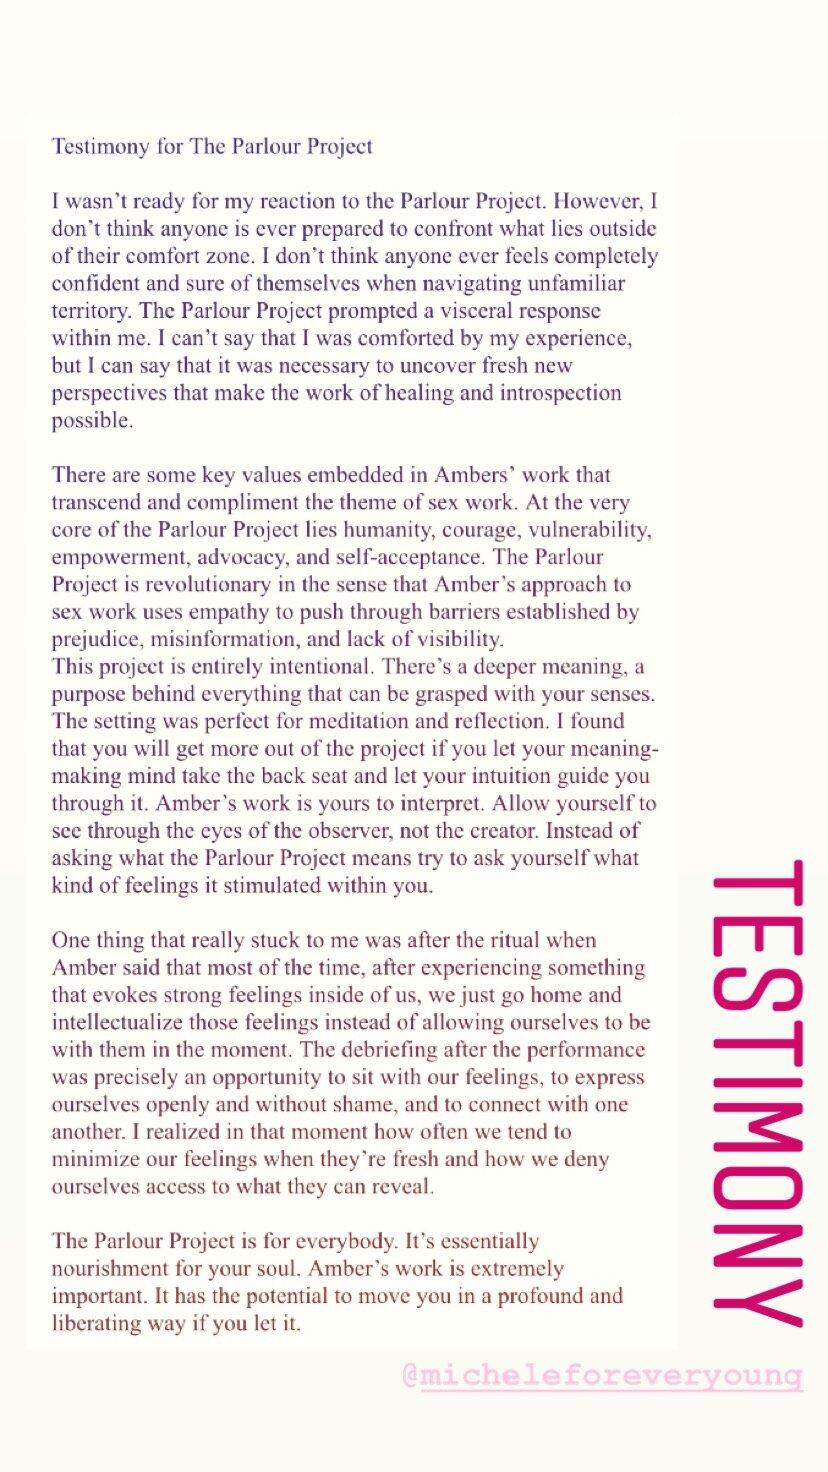 The Parlour Project Testimonial 10:04.jpg